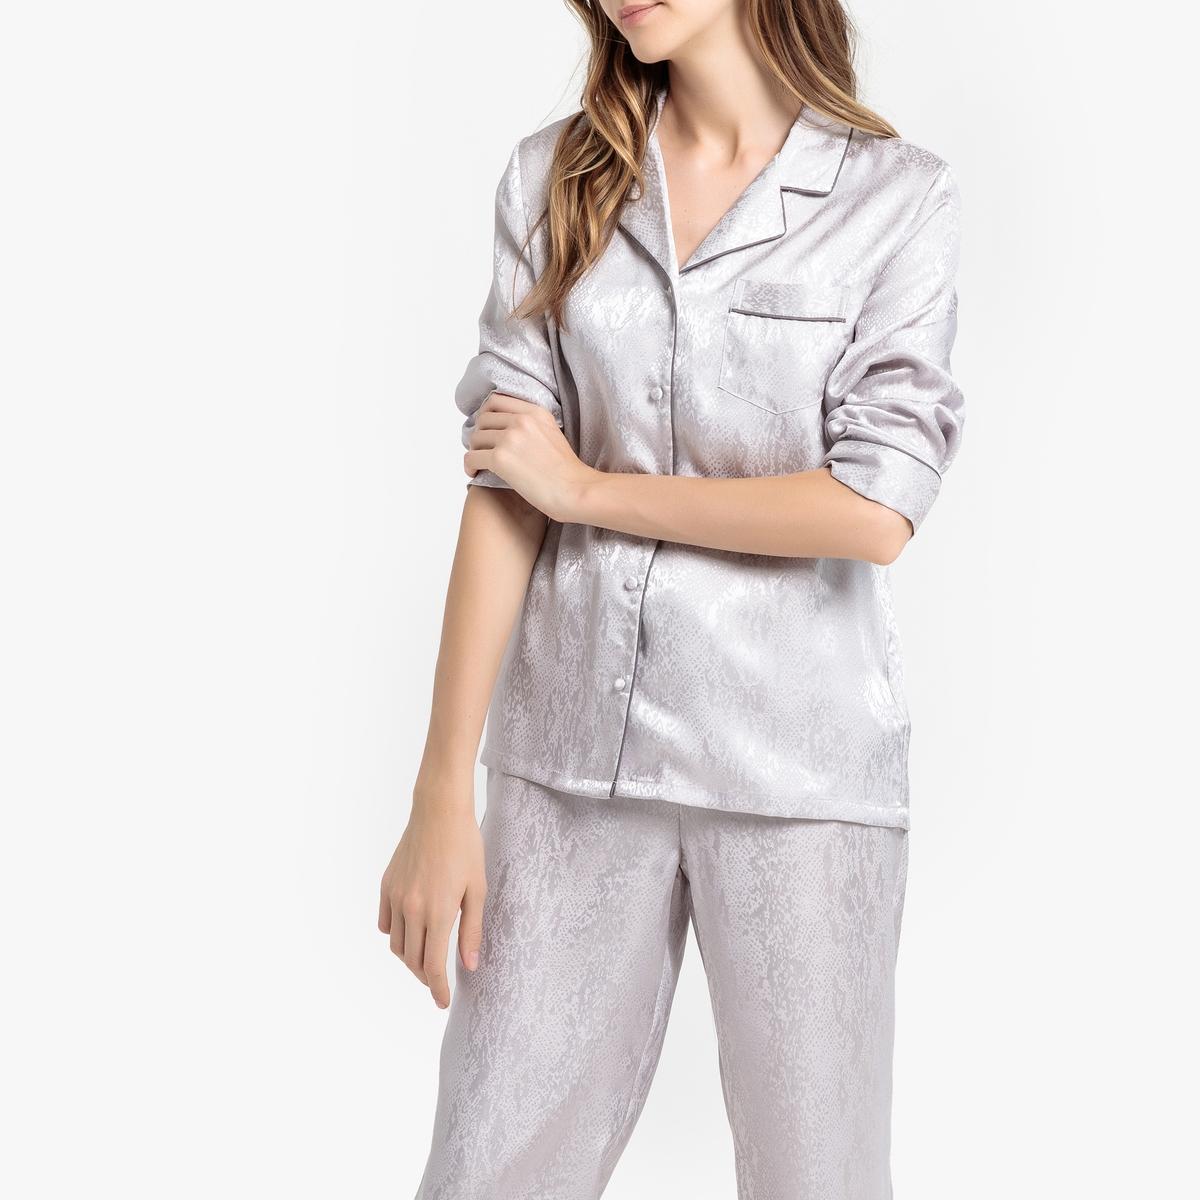 Pijama de satén jacquard